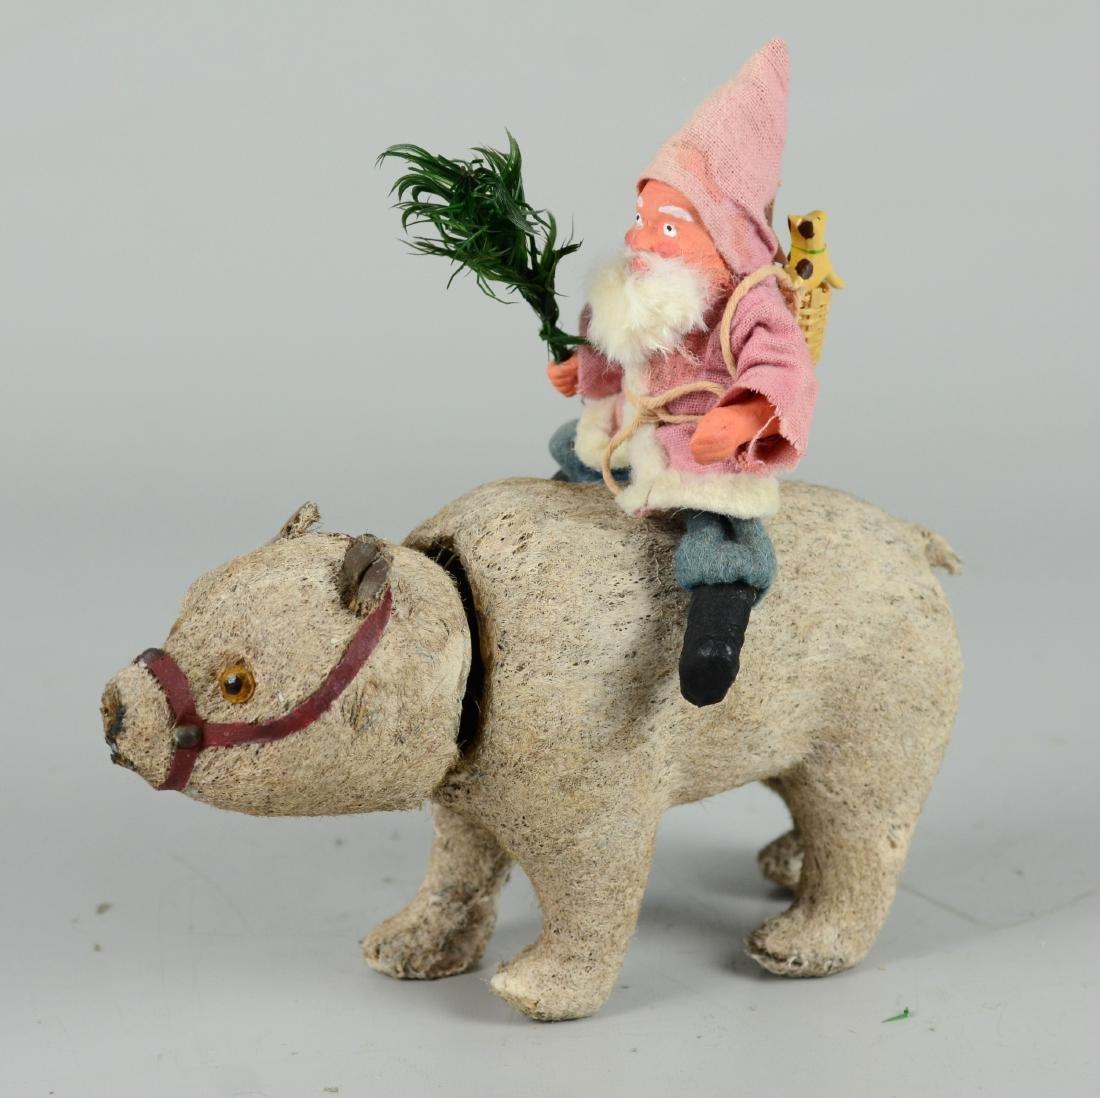 Santa Claus Riding on Polar Bear Figure